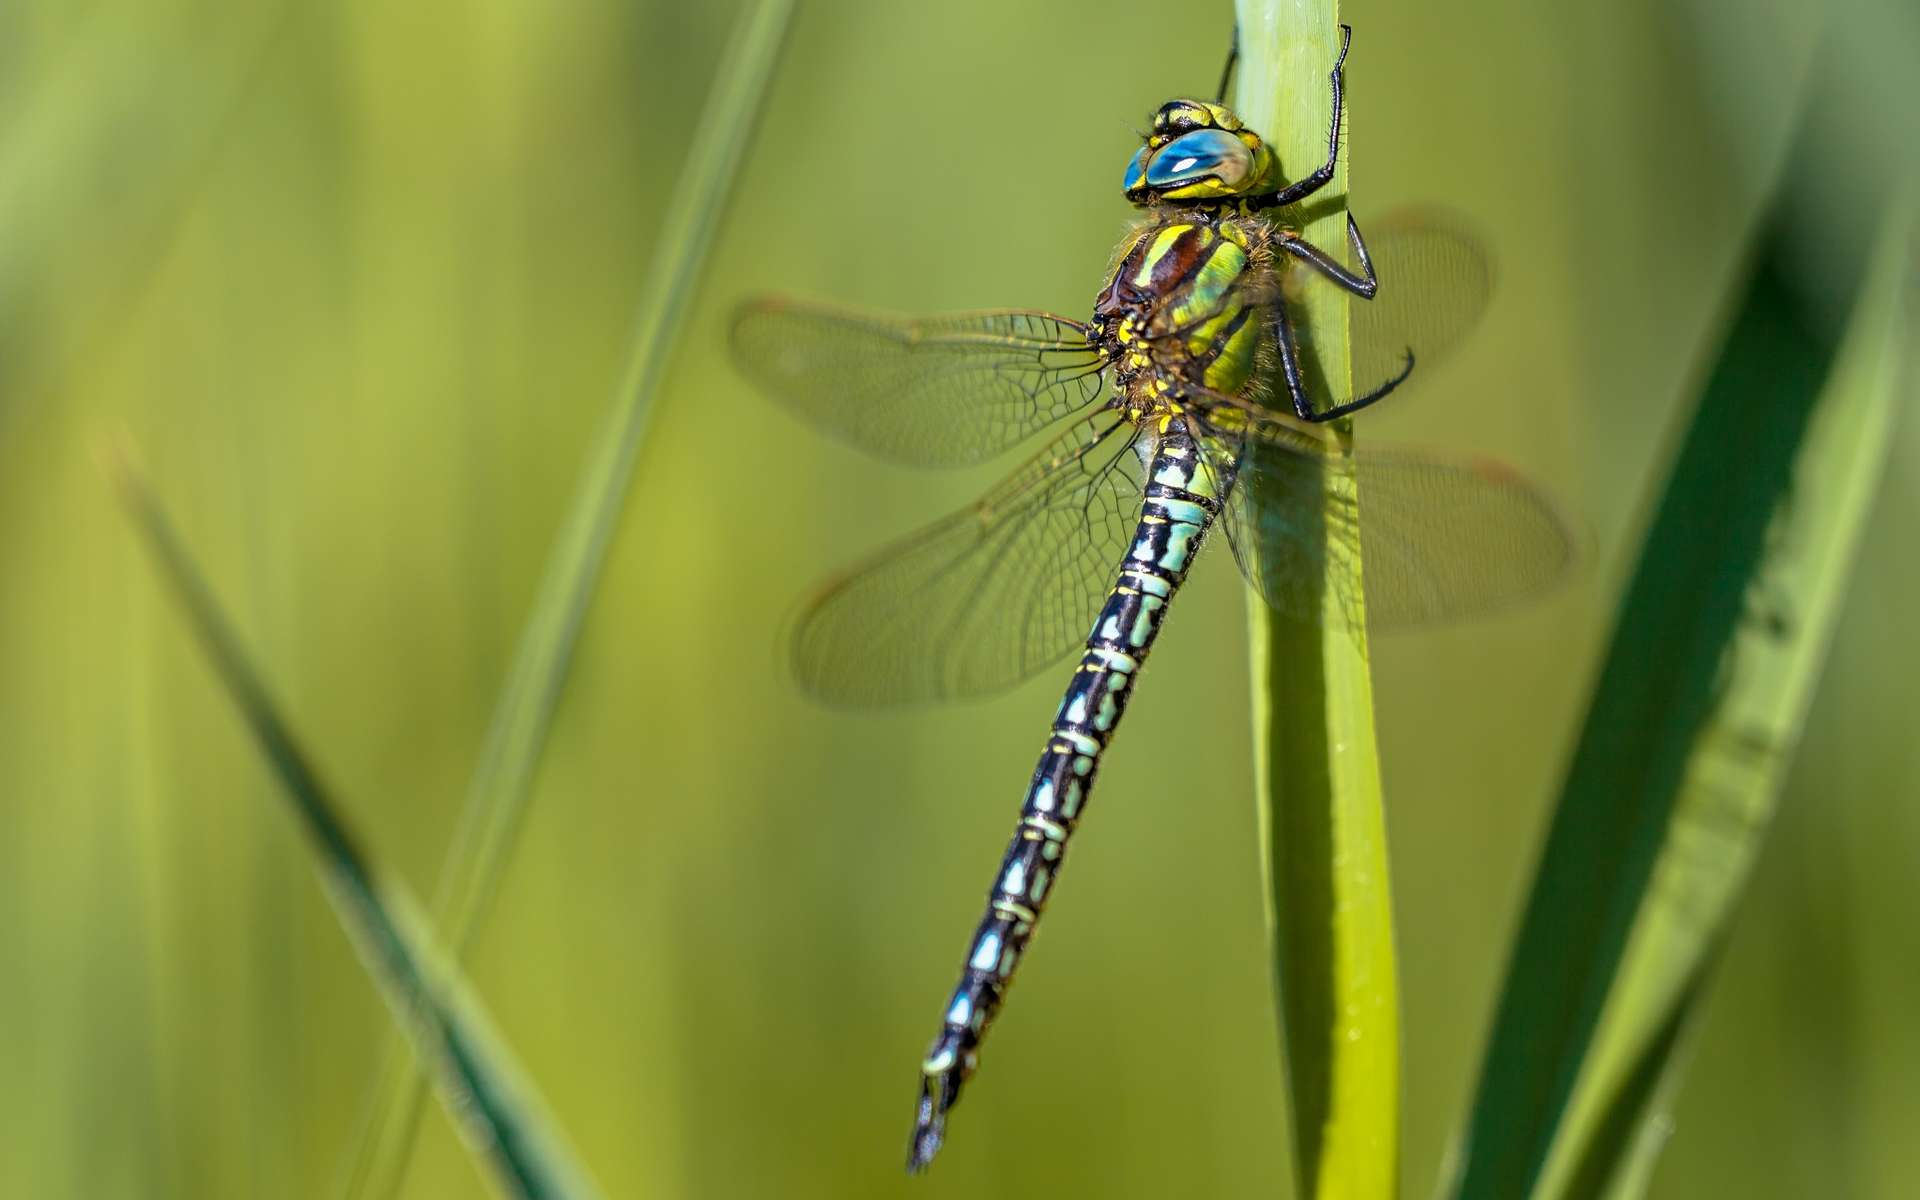 Brachytron pratense, ou aeschne printanière, est une libellule présente en France. © Rudmer Zwerver, Shutterstock